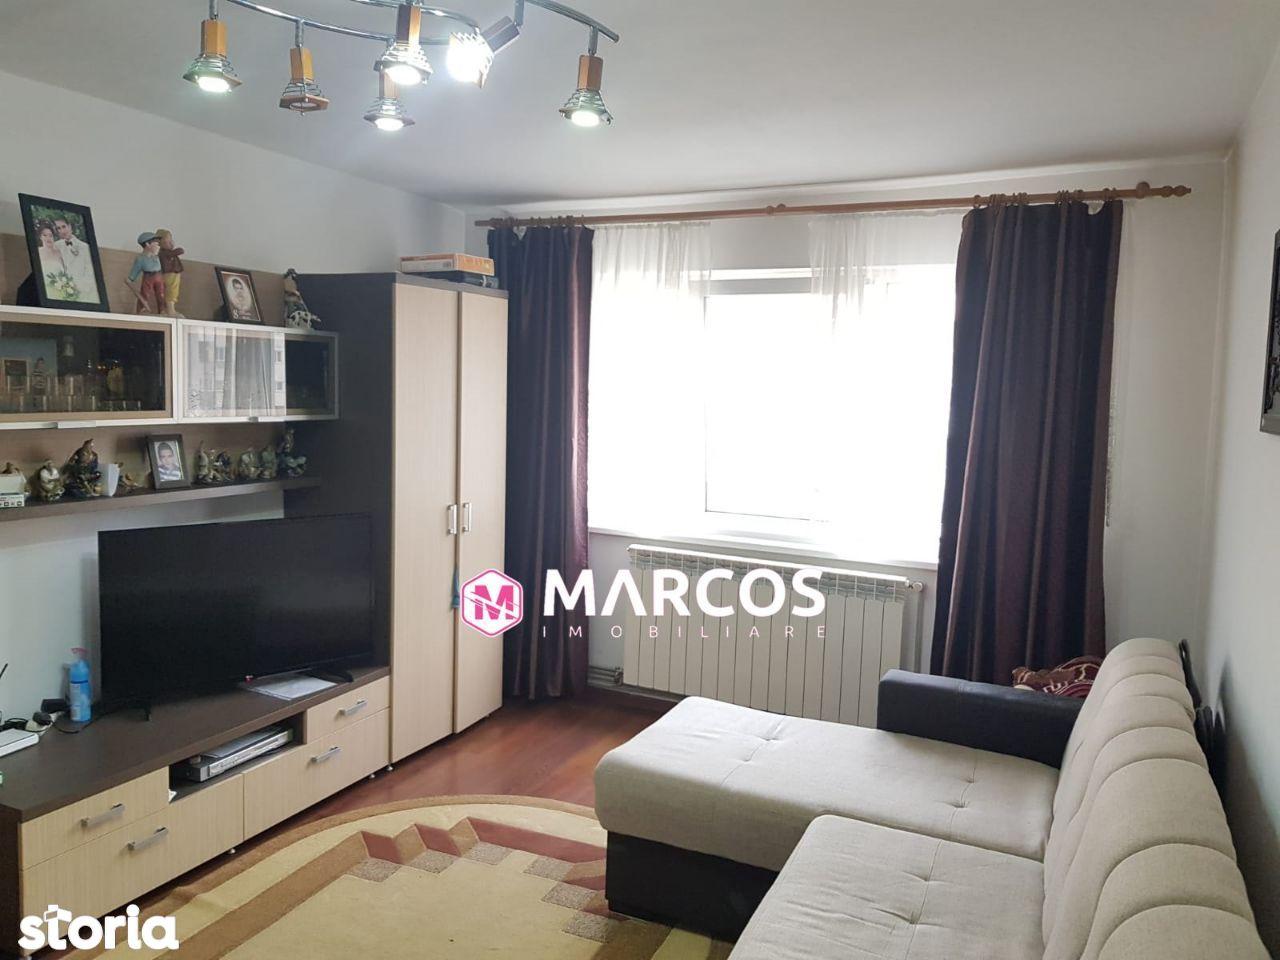 Apartament 2 camere semidecomandat, et.4/10, Micro 3, ID 727